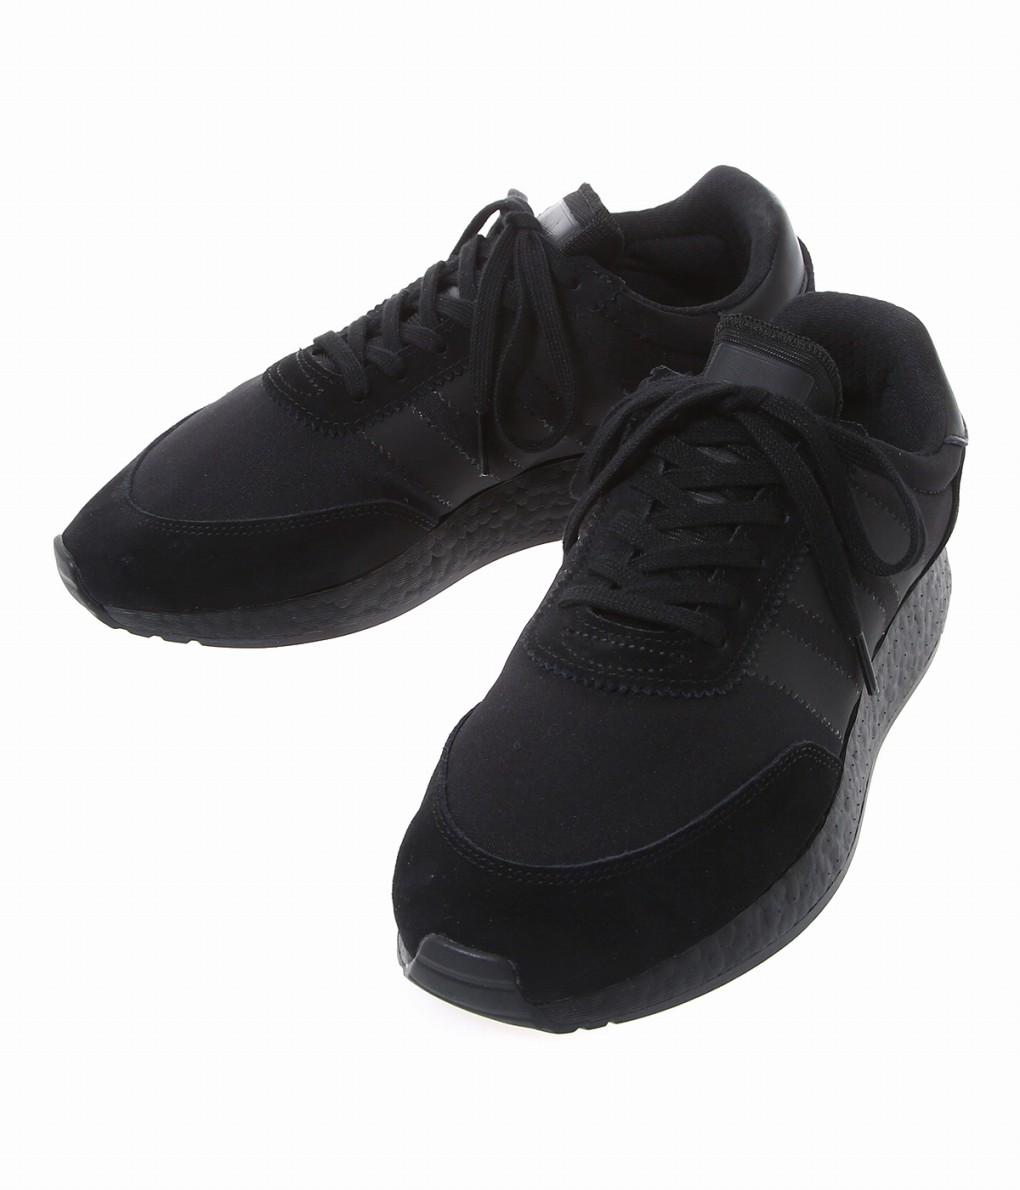 adidas Originals / アディダスオリジナルス : I-5923 : スニーカー アディダス メンズ : BD7525 【PIE】